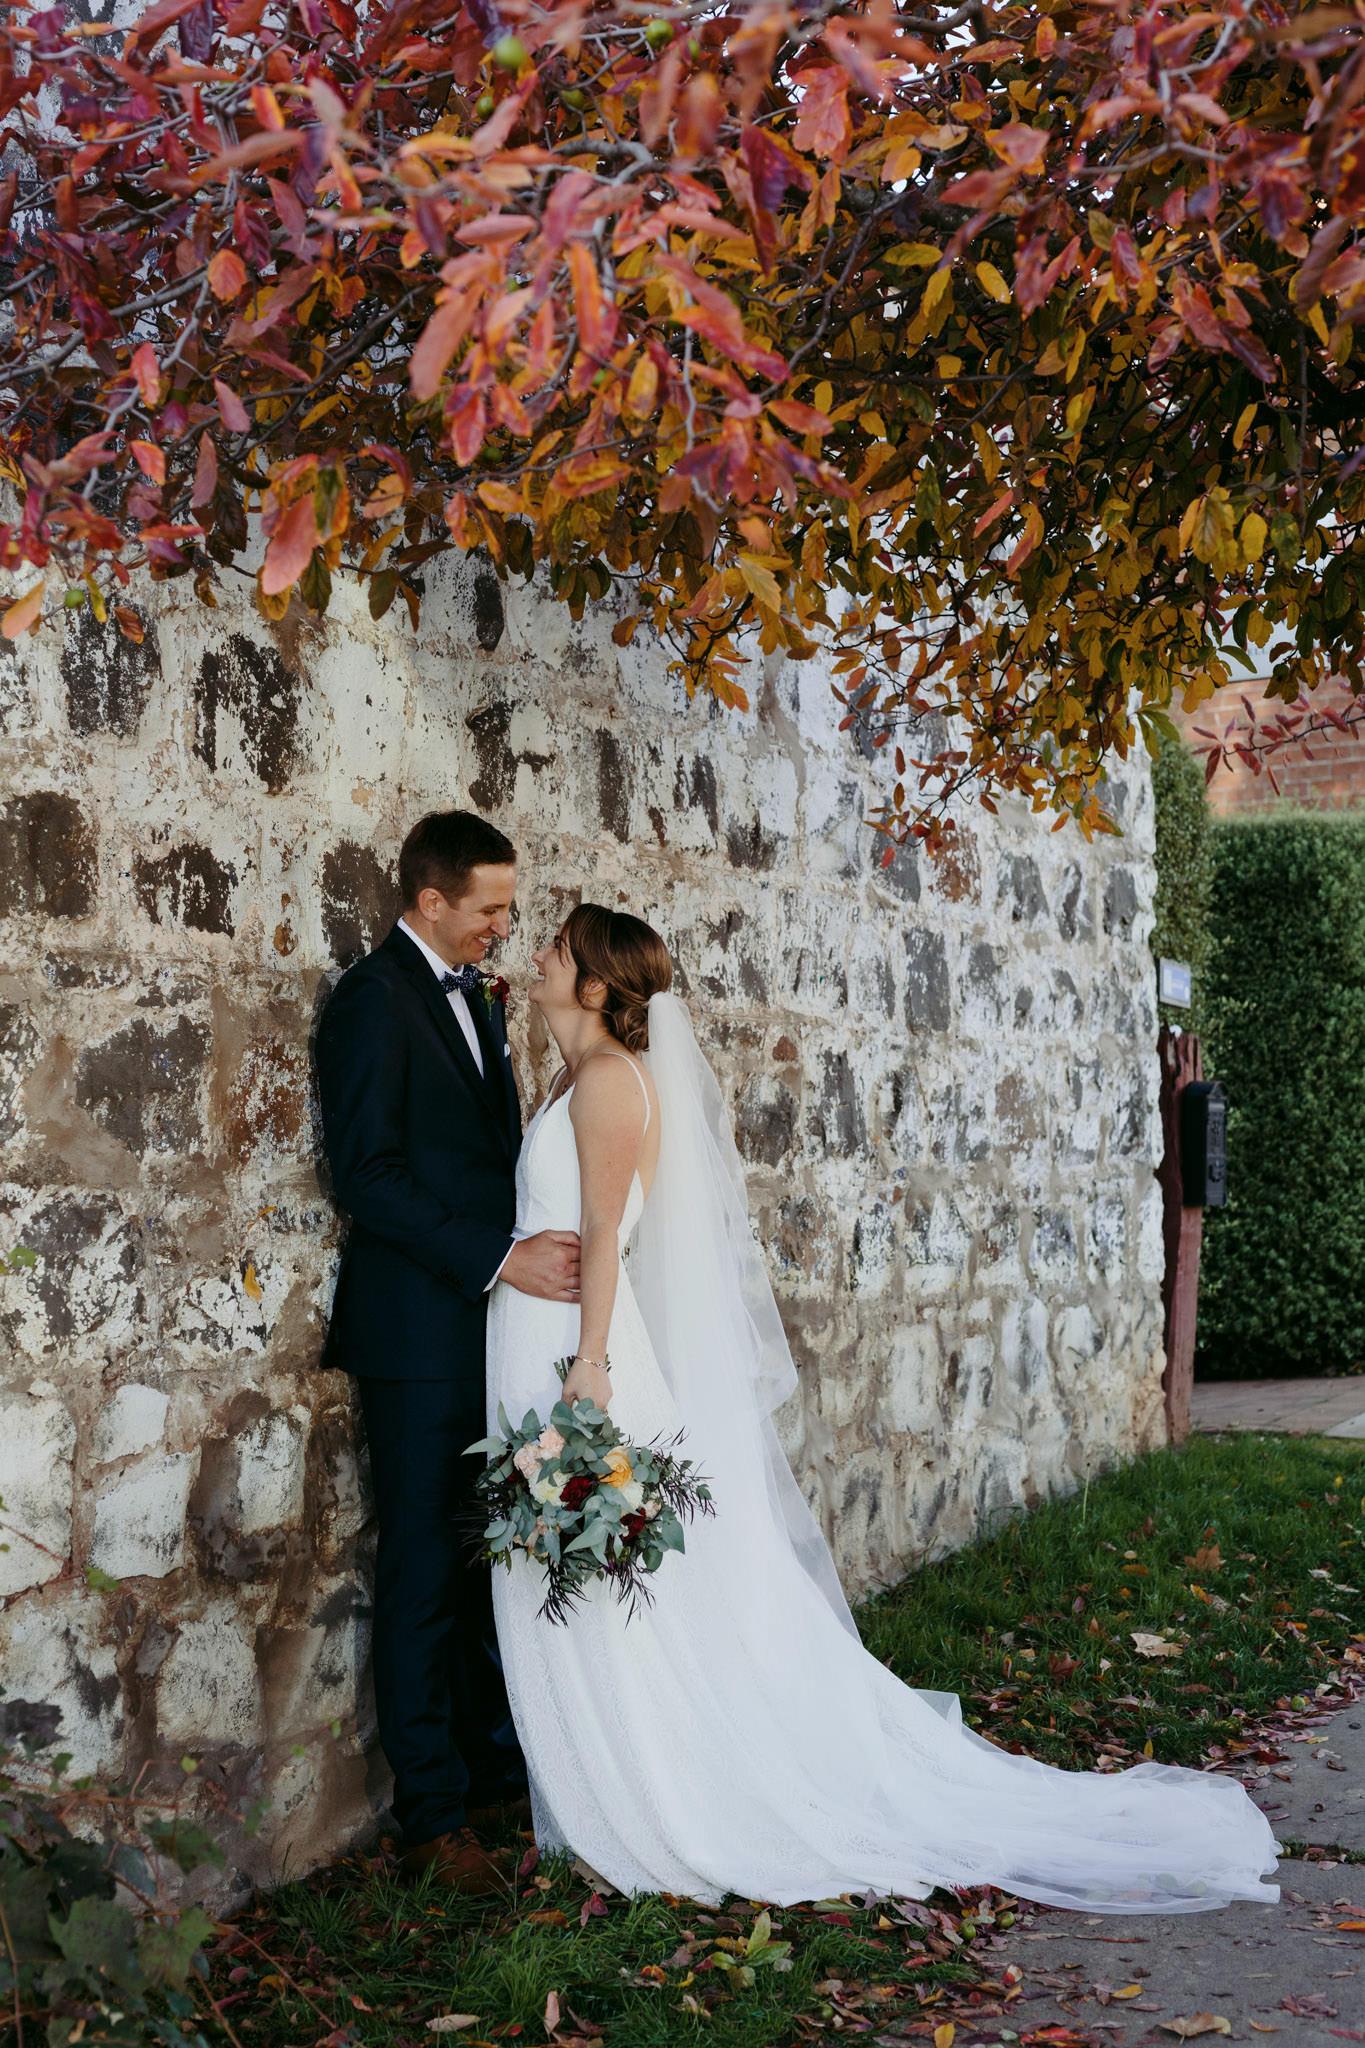 Erin Latimore Mudgee Canberra Wedding Photographer ROSEBANK GUESTHOUSE OLD THEATRE TONIC MILLTHORPE_515.JPG